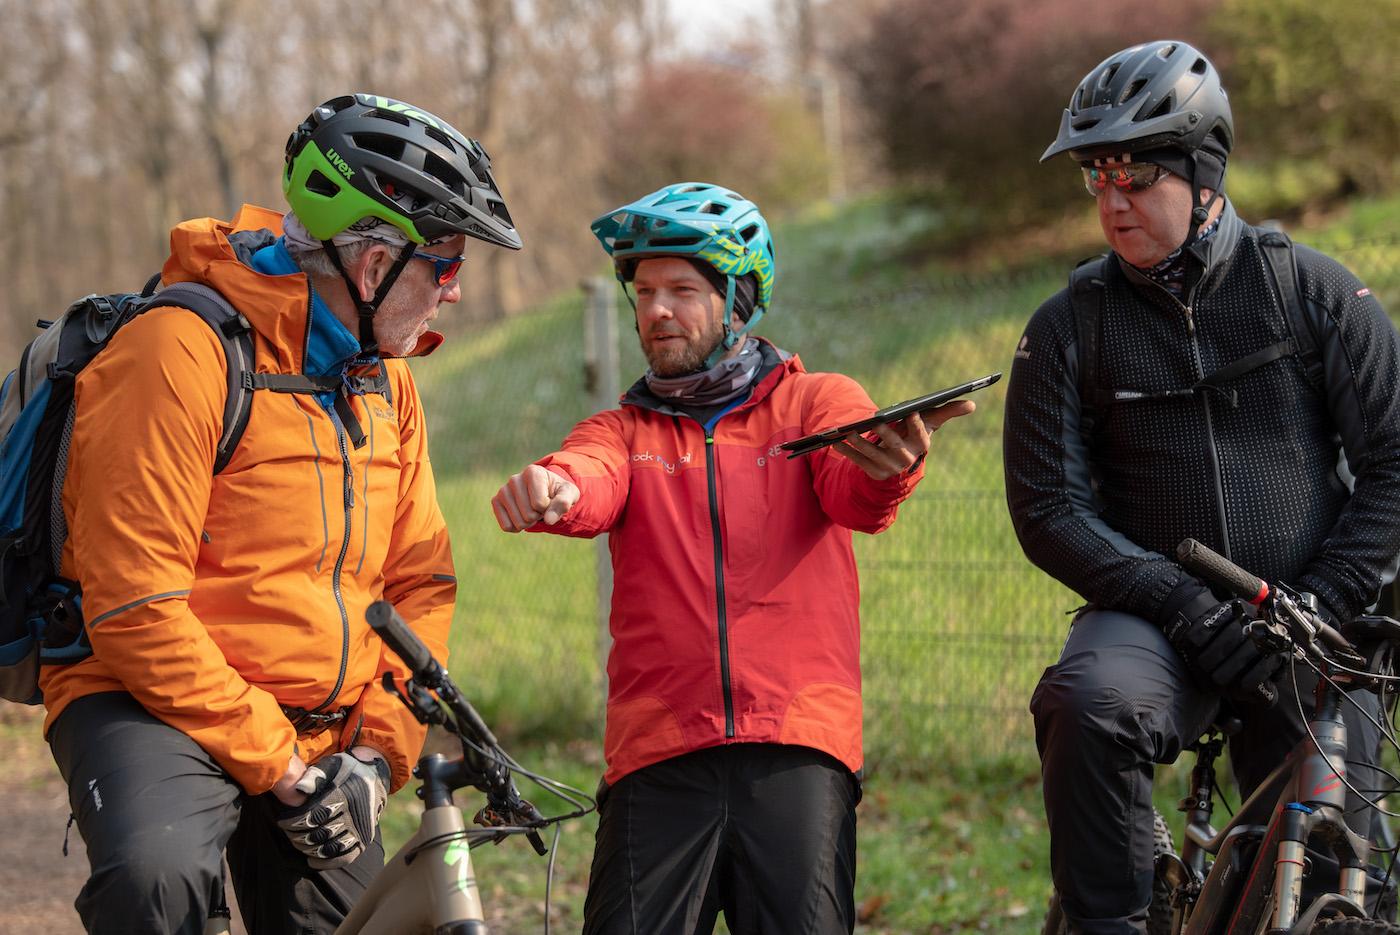 eMTB eBike Fortgeschritten Fahrtechnik Kurs in Siegen - Rock my Trail Bikeschule330